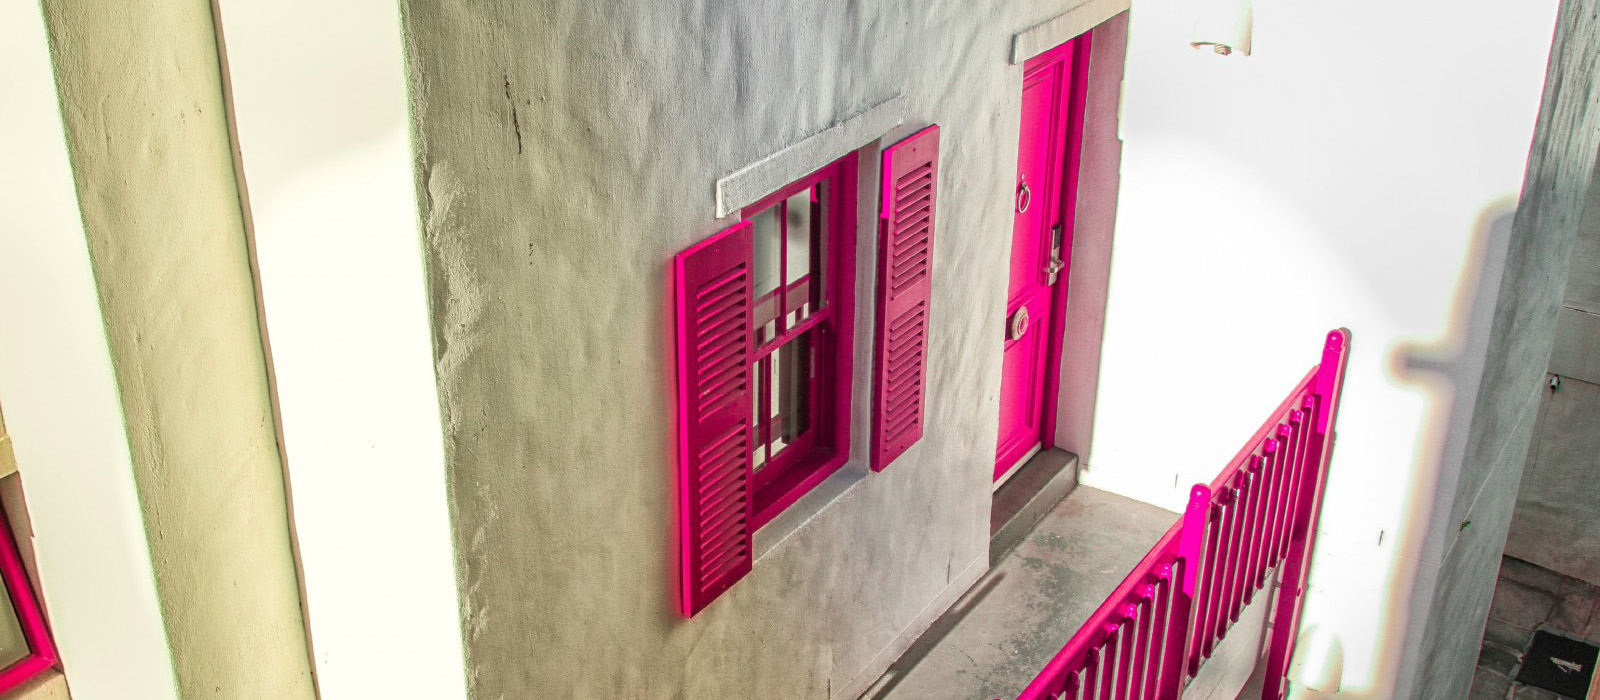 inmobiliaria chiclana